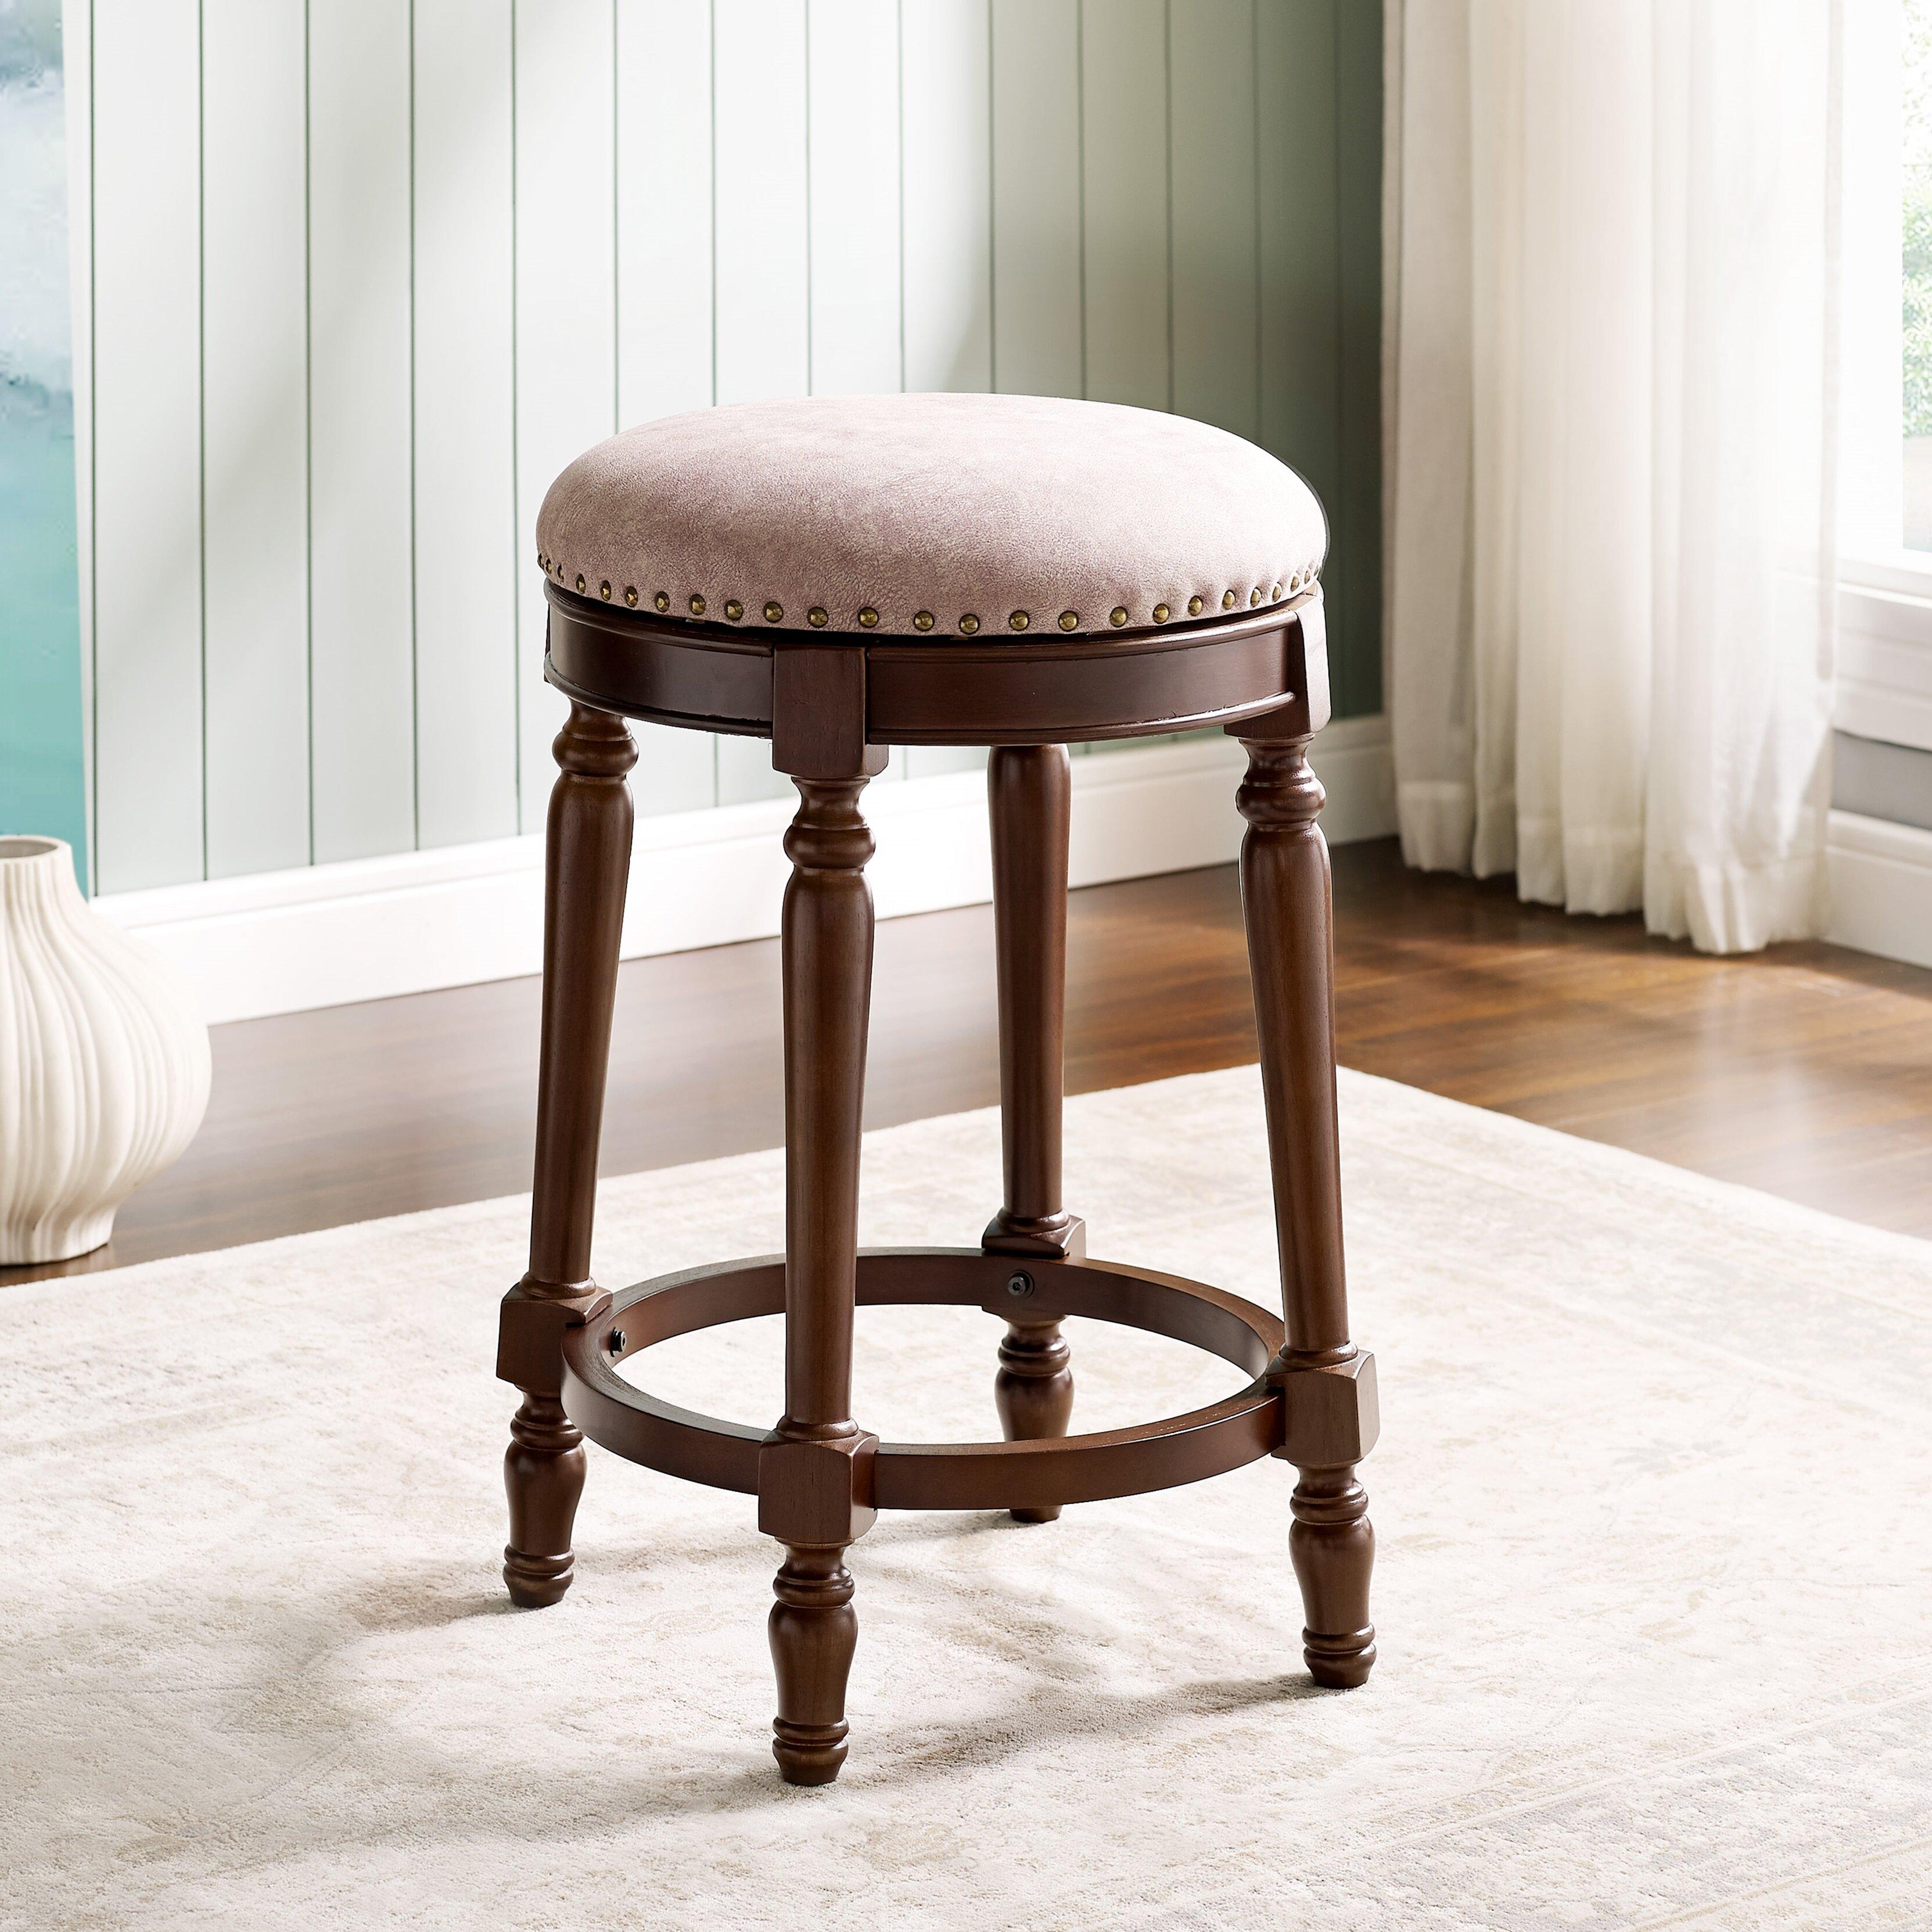 Superb Eck 25 Swivel Bar Stool Bralicious Painted Fabric Chair Ideas Braliciousco